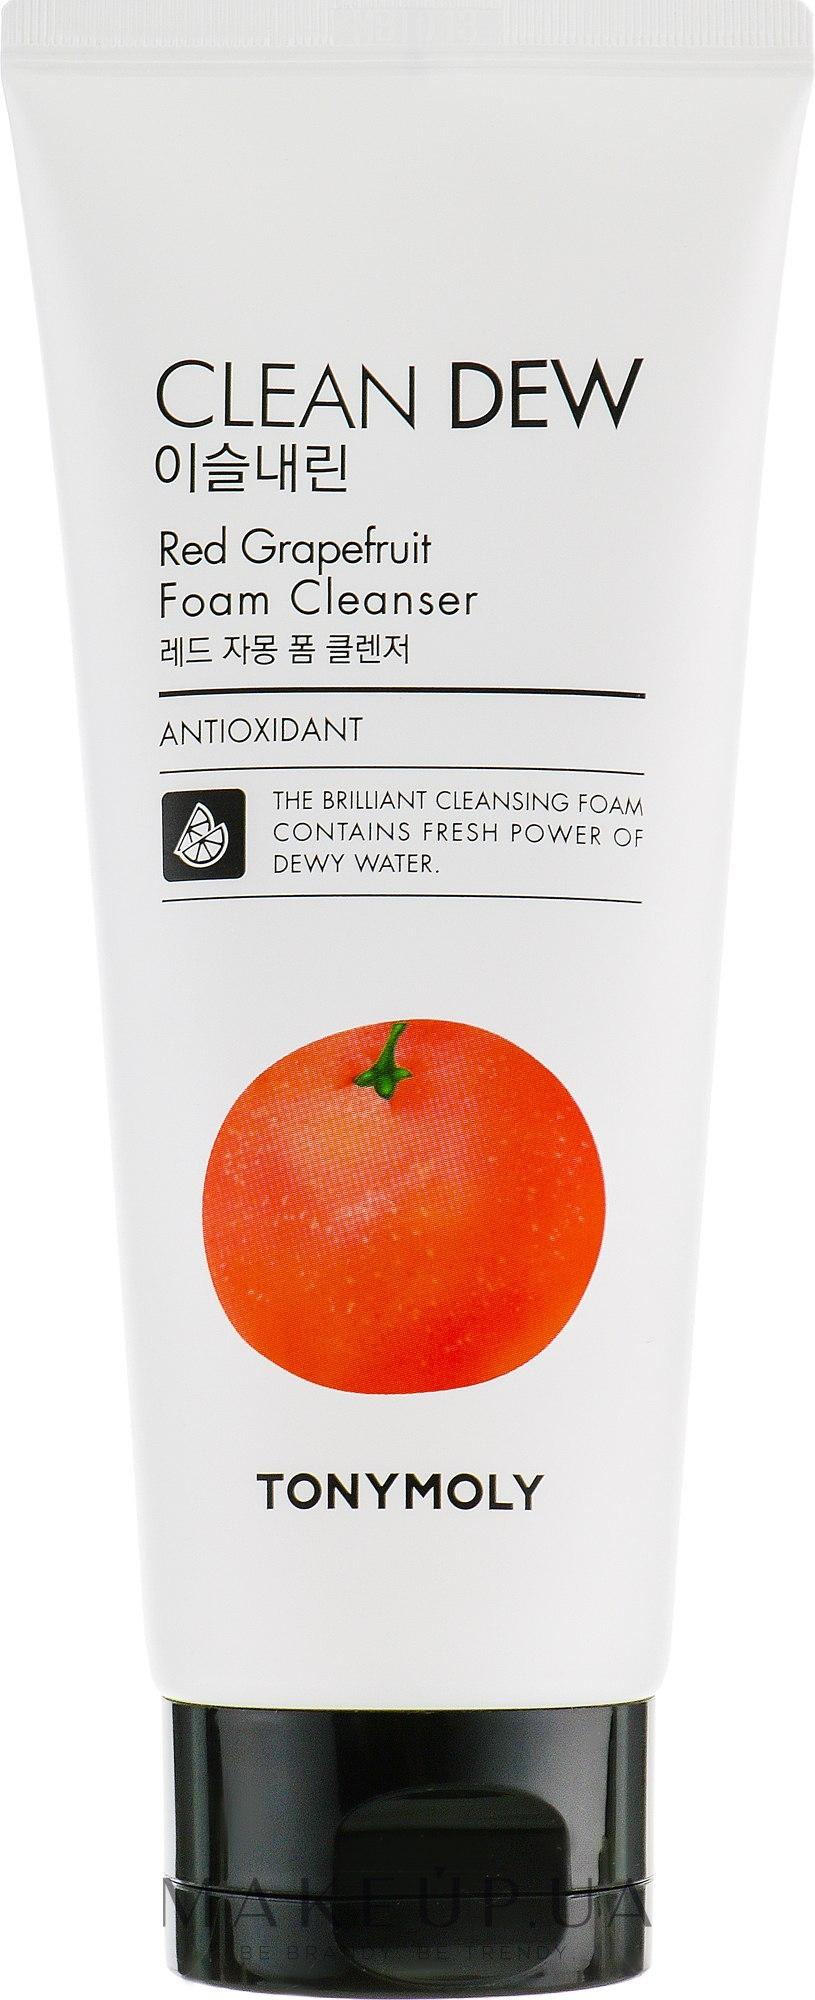 Пенка для умывания с экстрактом грейпфрута Tony Moly Clean Dew Foam Cleanser Grapefruit 180ml 0 - Фото 1